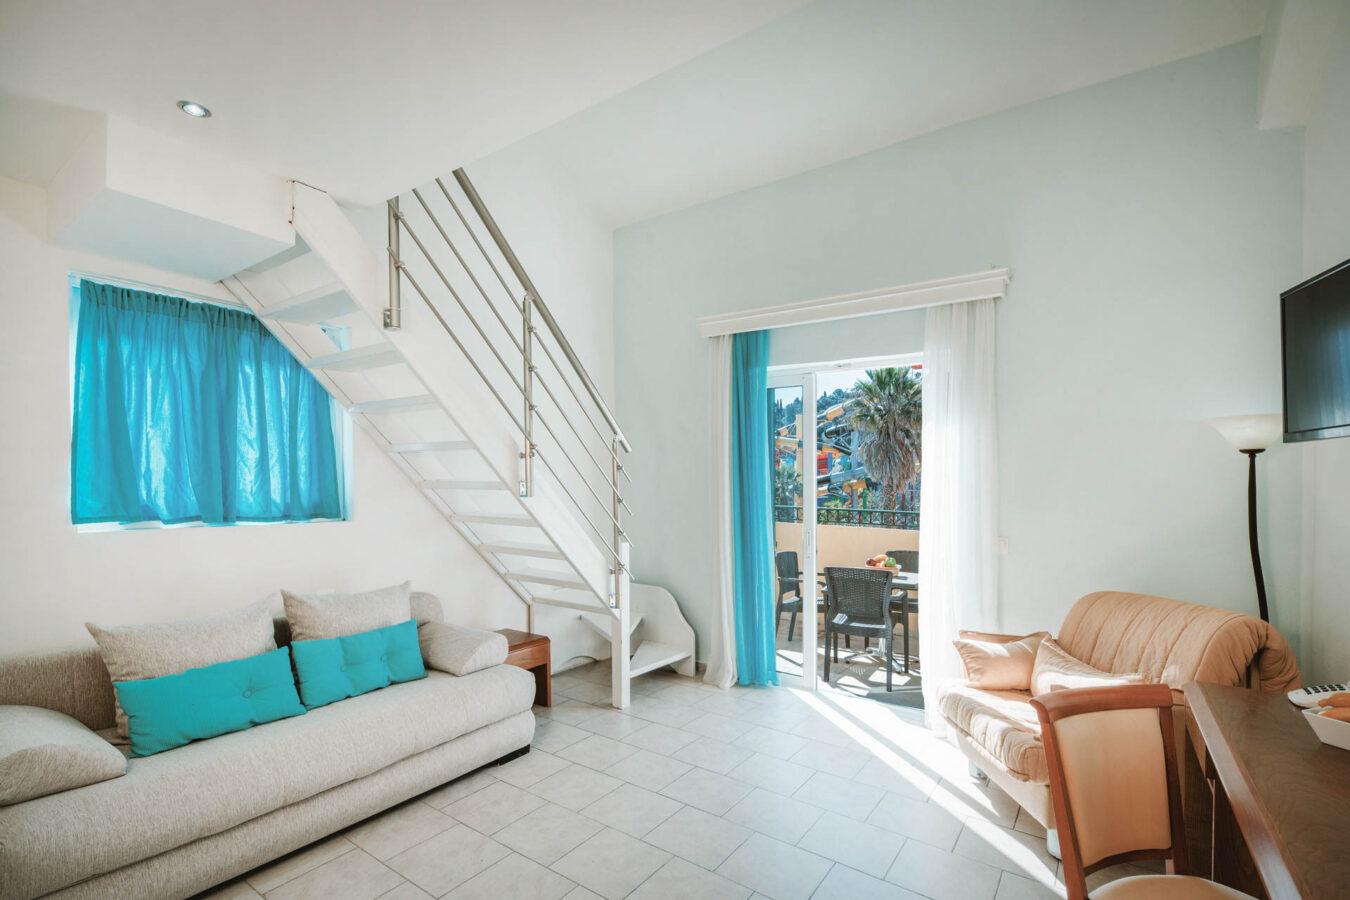 Aqualand Hotel in Corfu 66